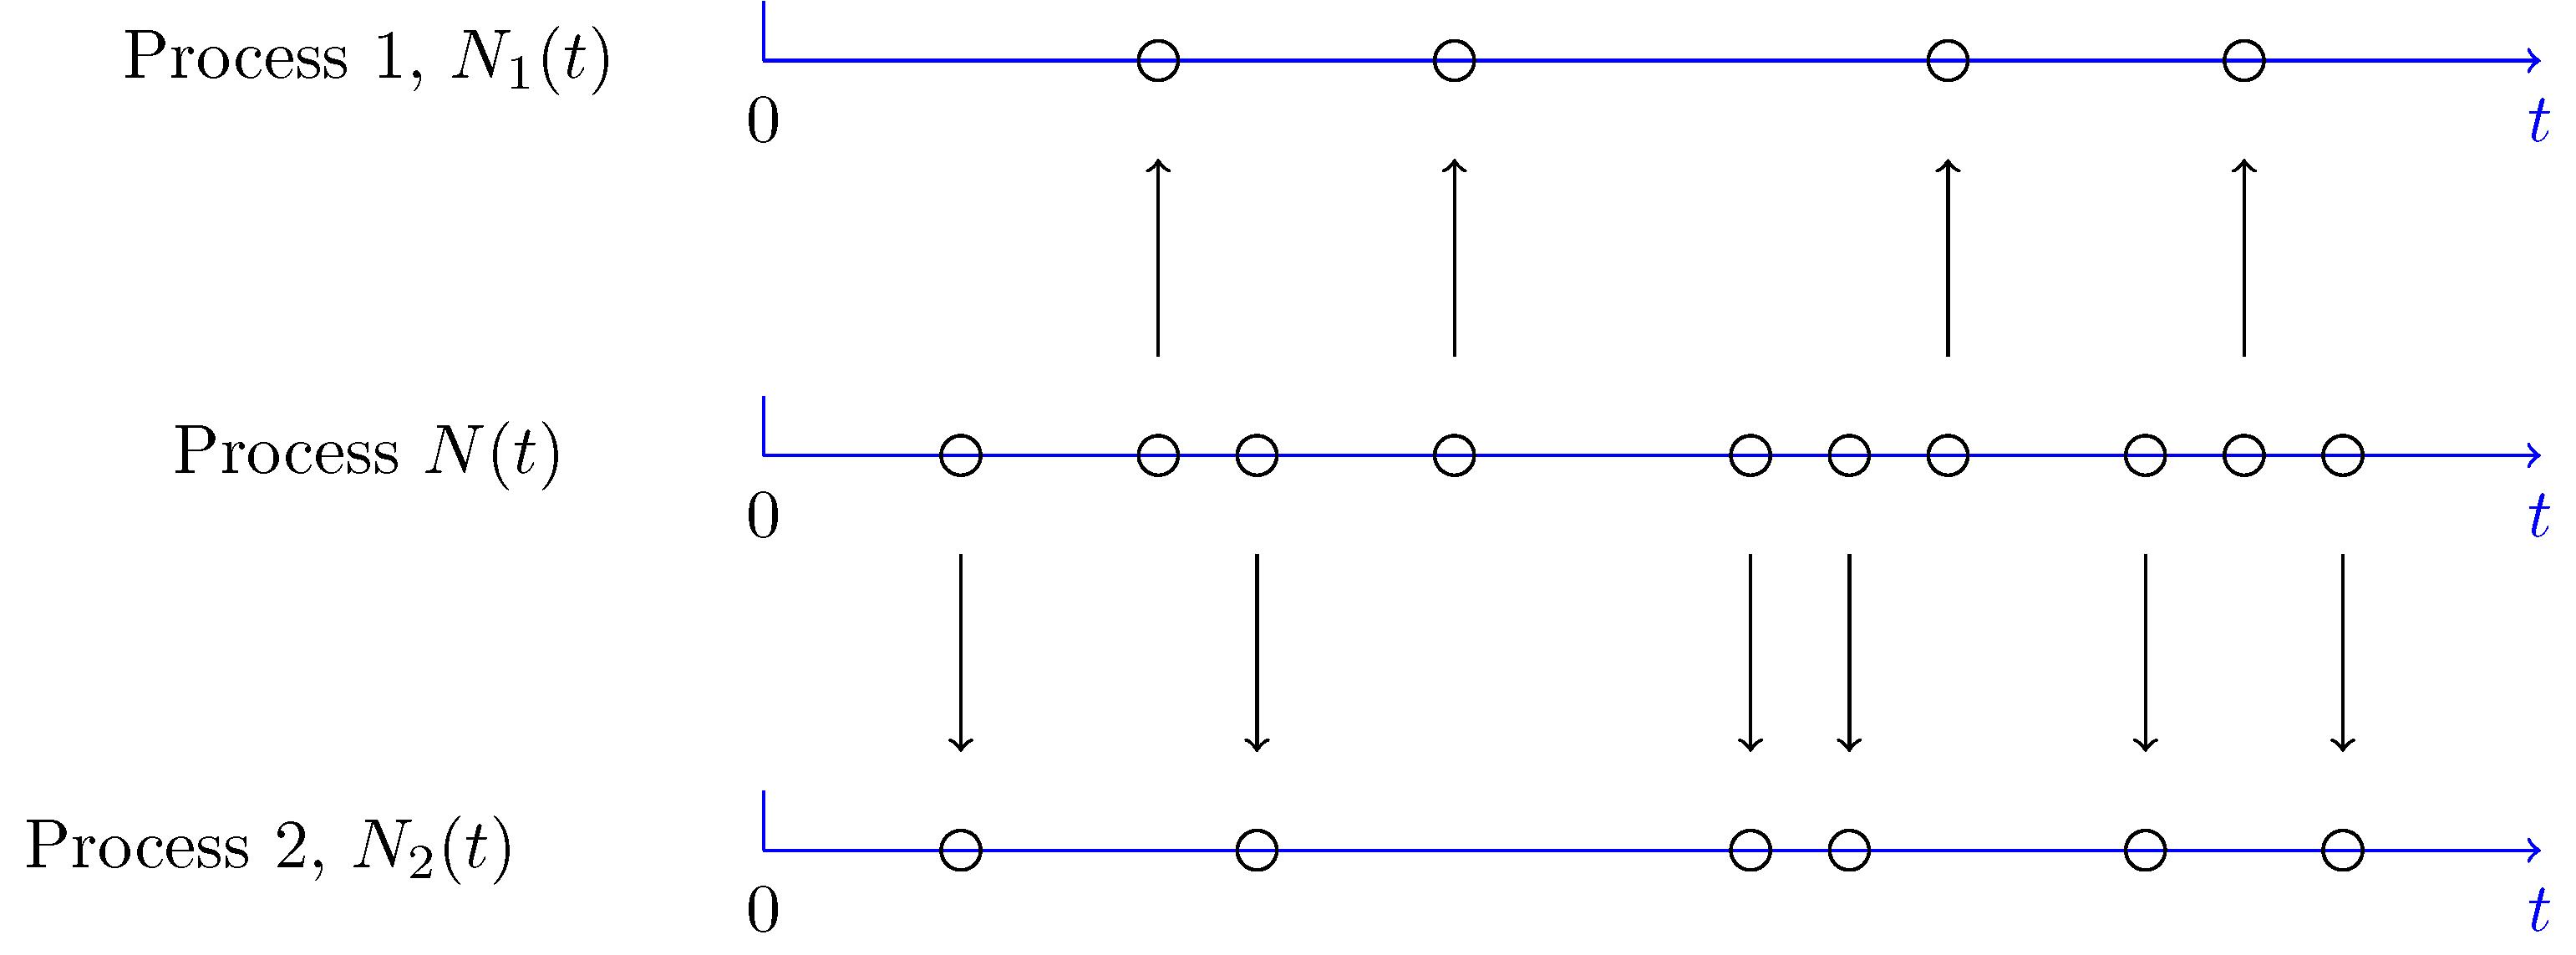 Merging and Splitting Poisson Processes